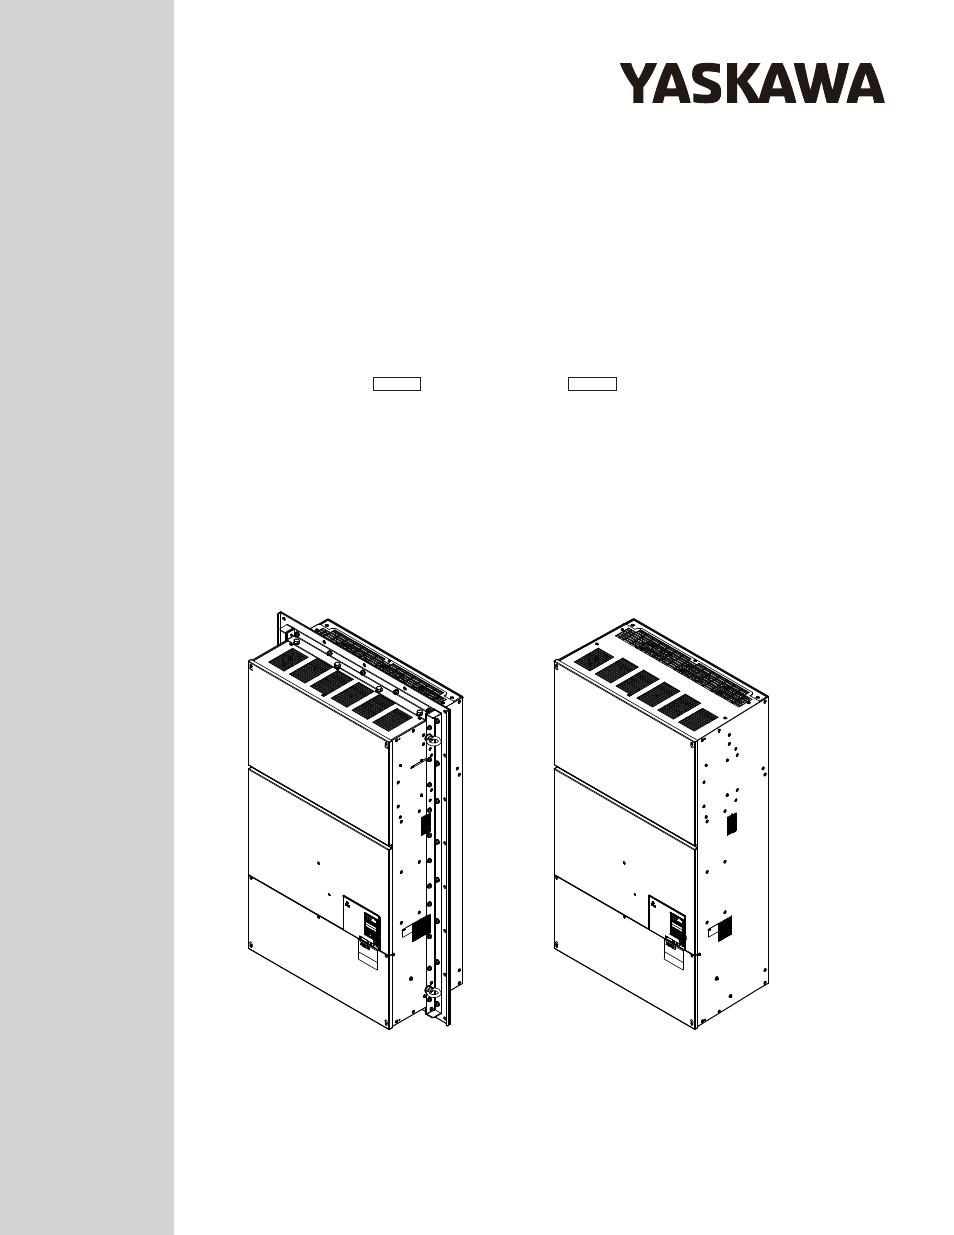 Wondrous Yaskawa Vfd Wiring Diagrams Auto Electrical Wiring Diagram Wiring 101 Archstreekradiomeanderfmnl